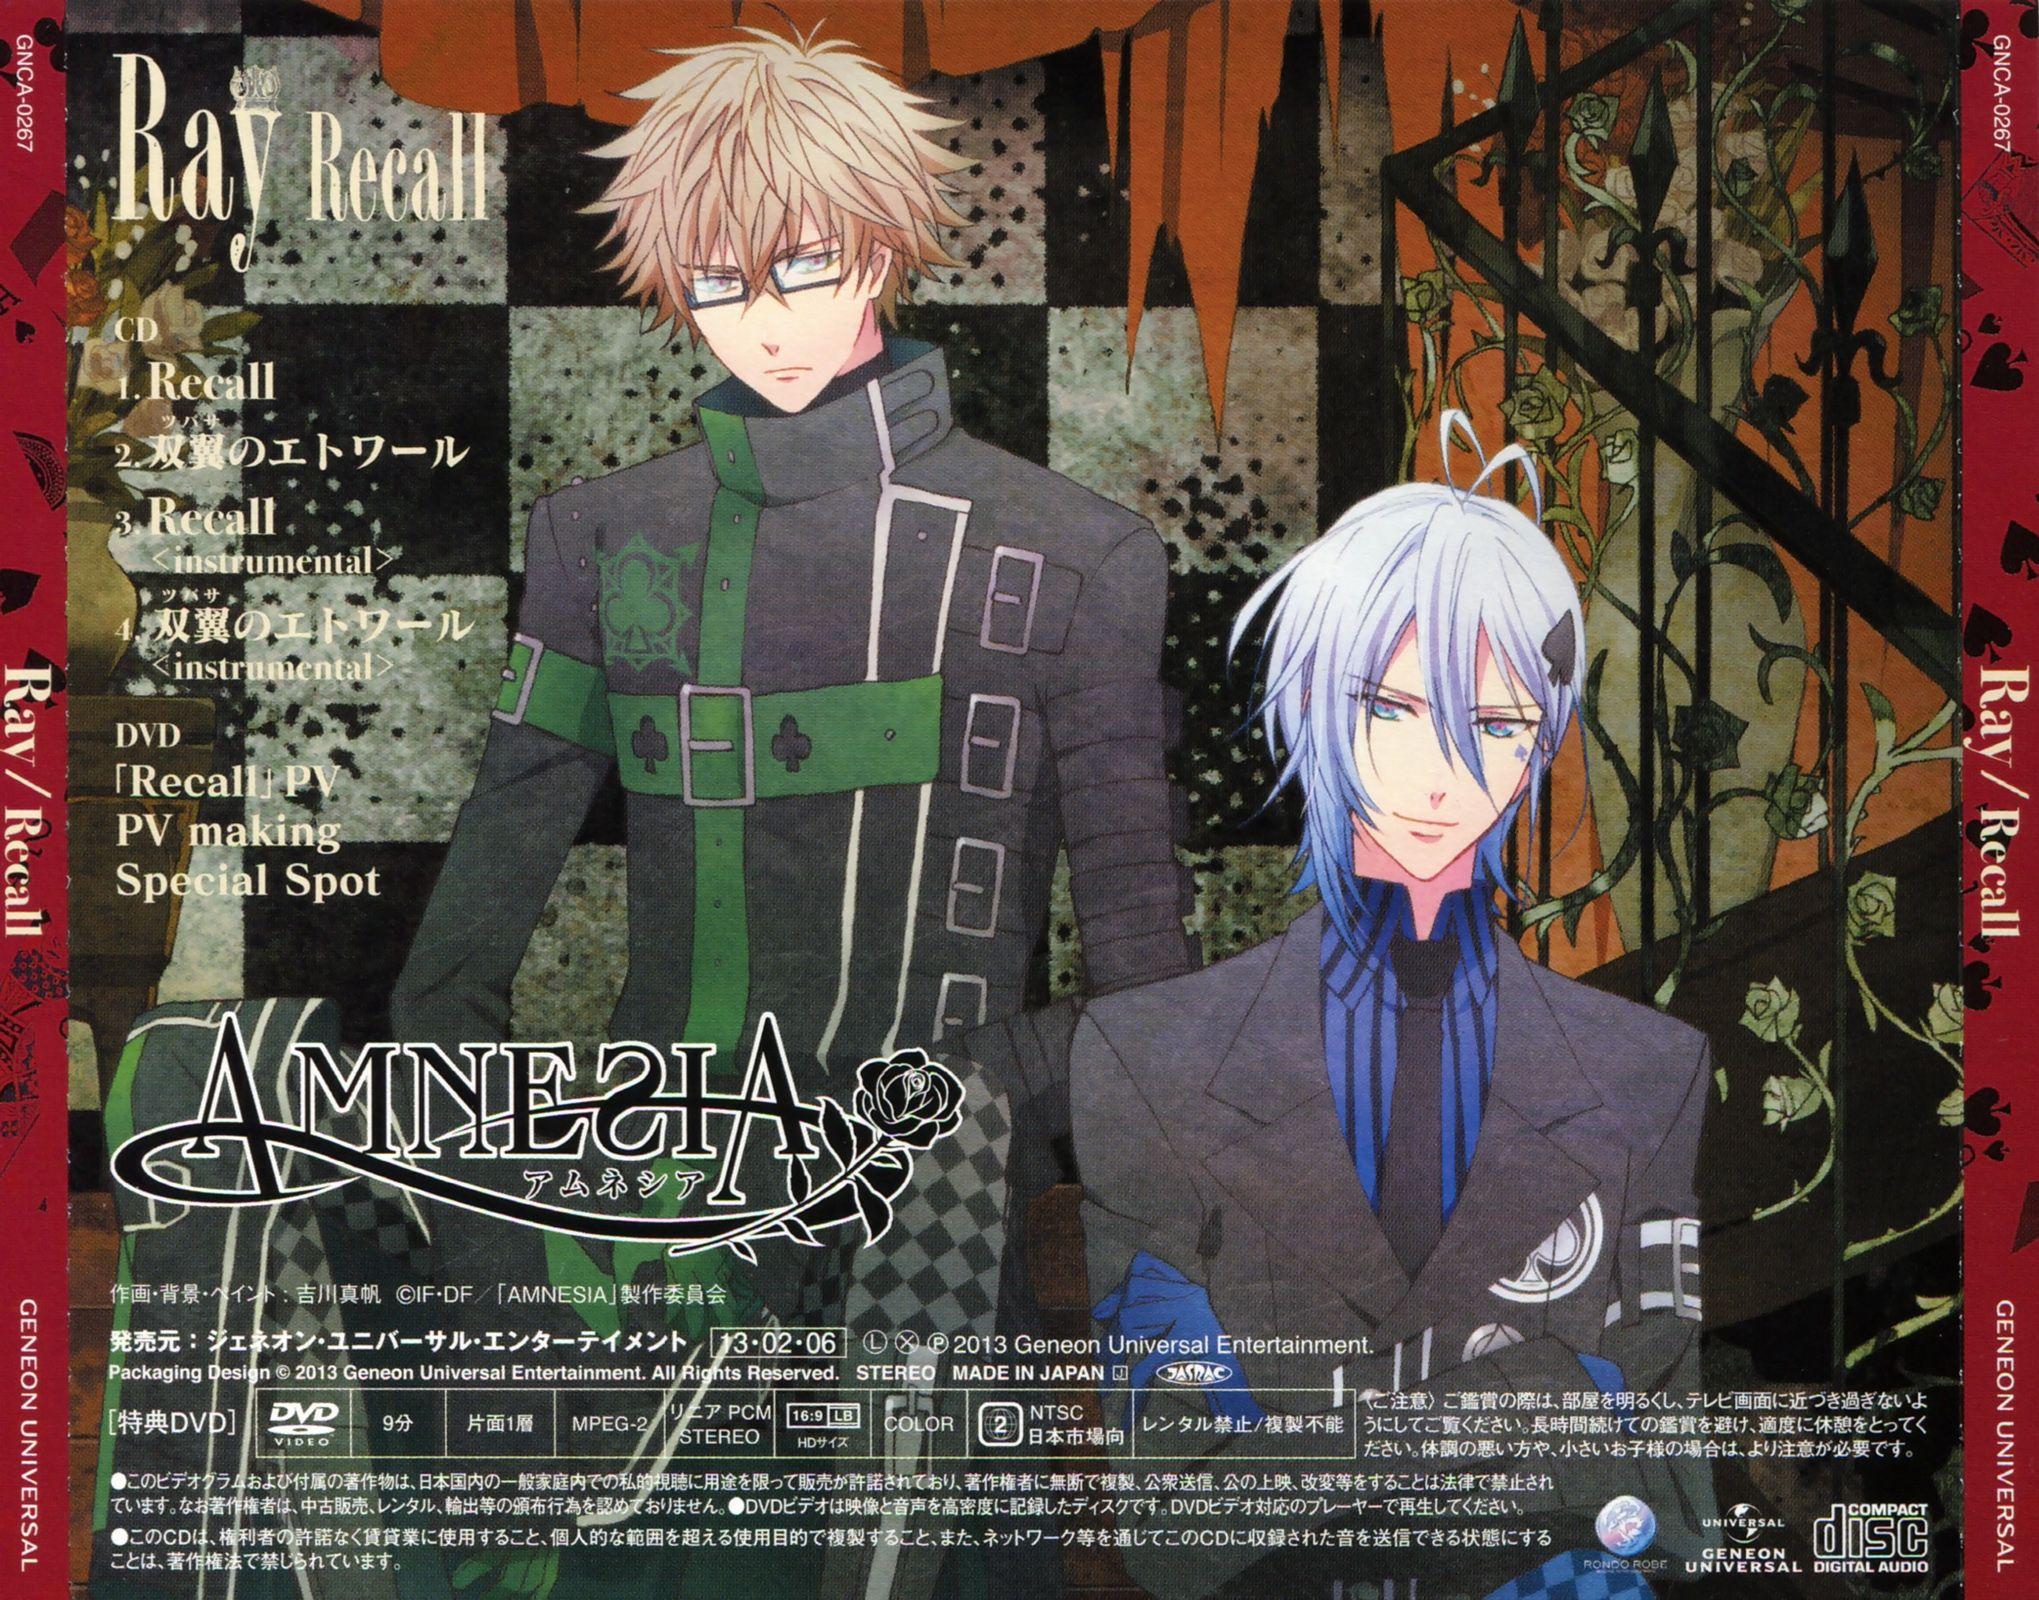 AMNESIA, Ikki, Kent Amnesia anime, Amnesia, Amnesia memories